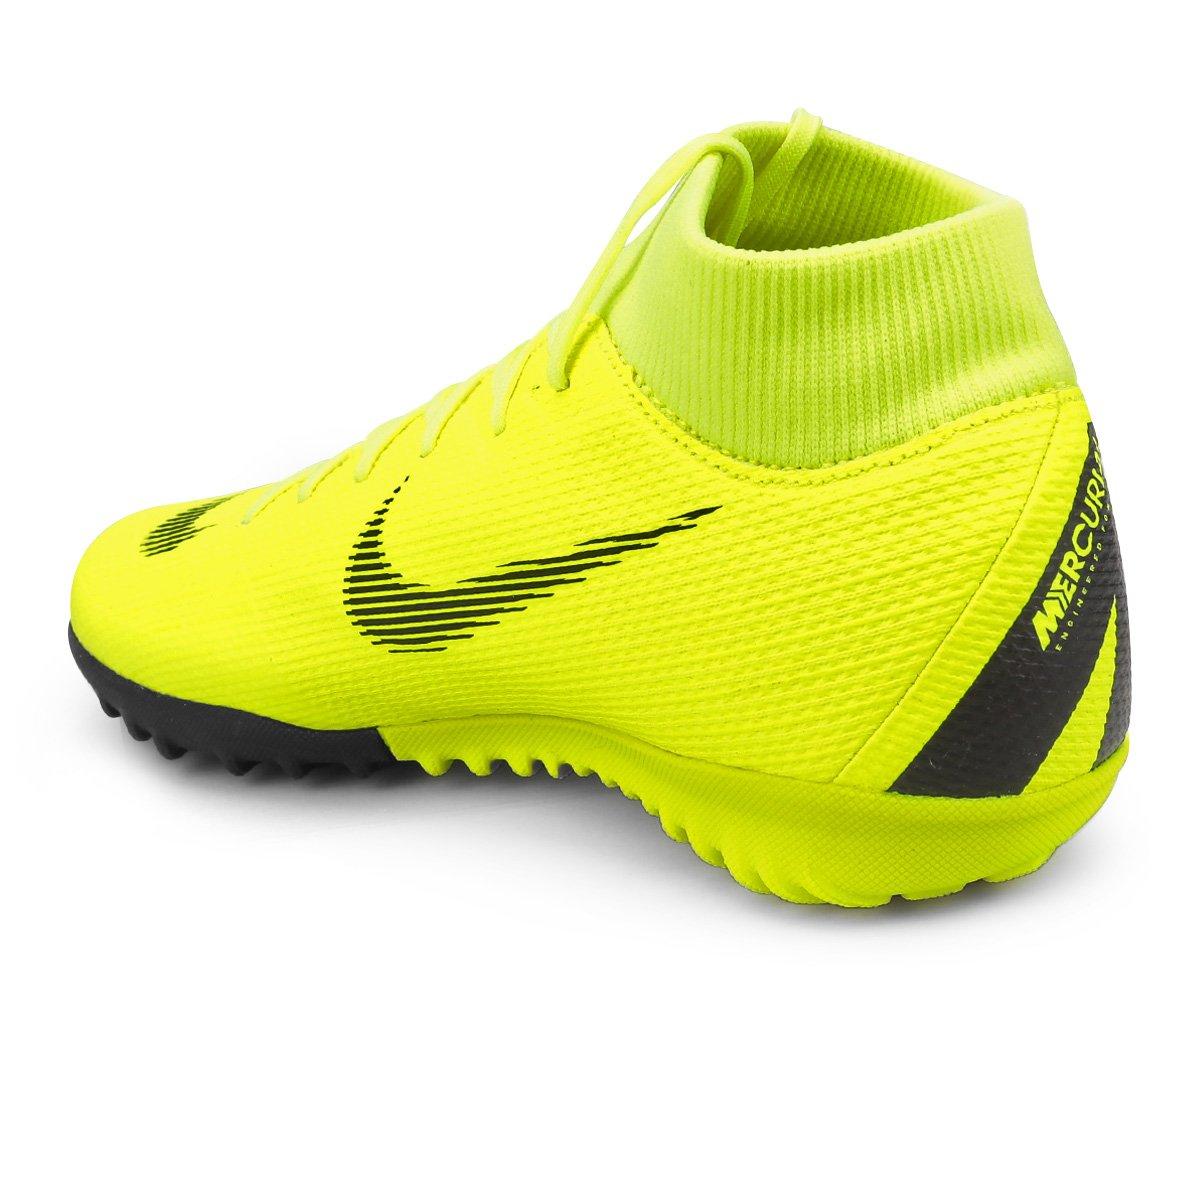 Chuteira Society Nike Mercurial Superfly 6 Academy - Amarelo e Preto ... 36dedf6a98cd1